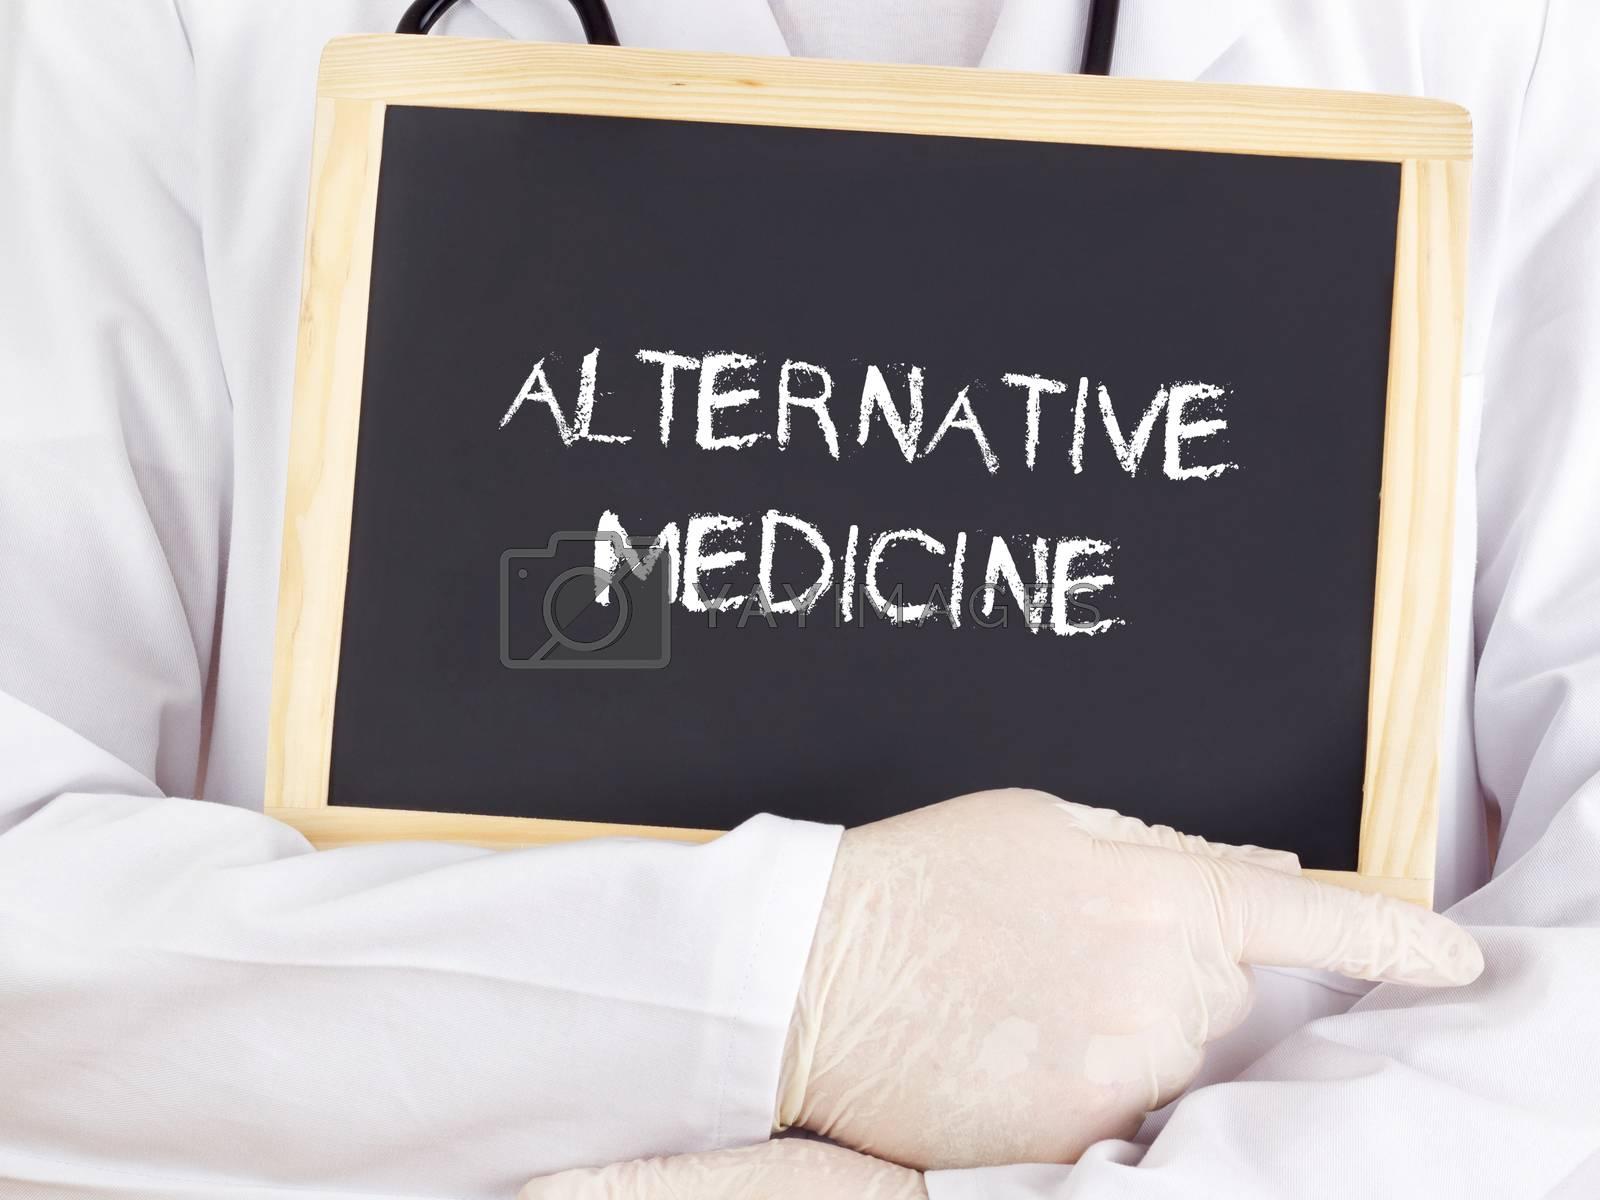 Doctor shows information on blackboard: alternative medicine